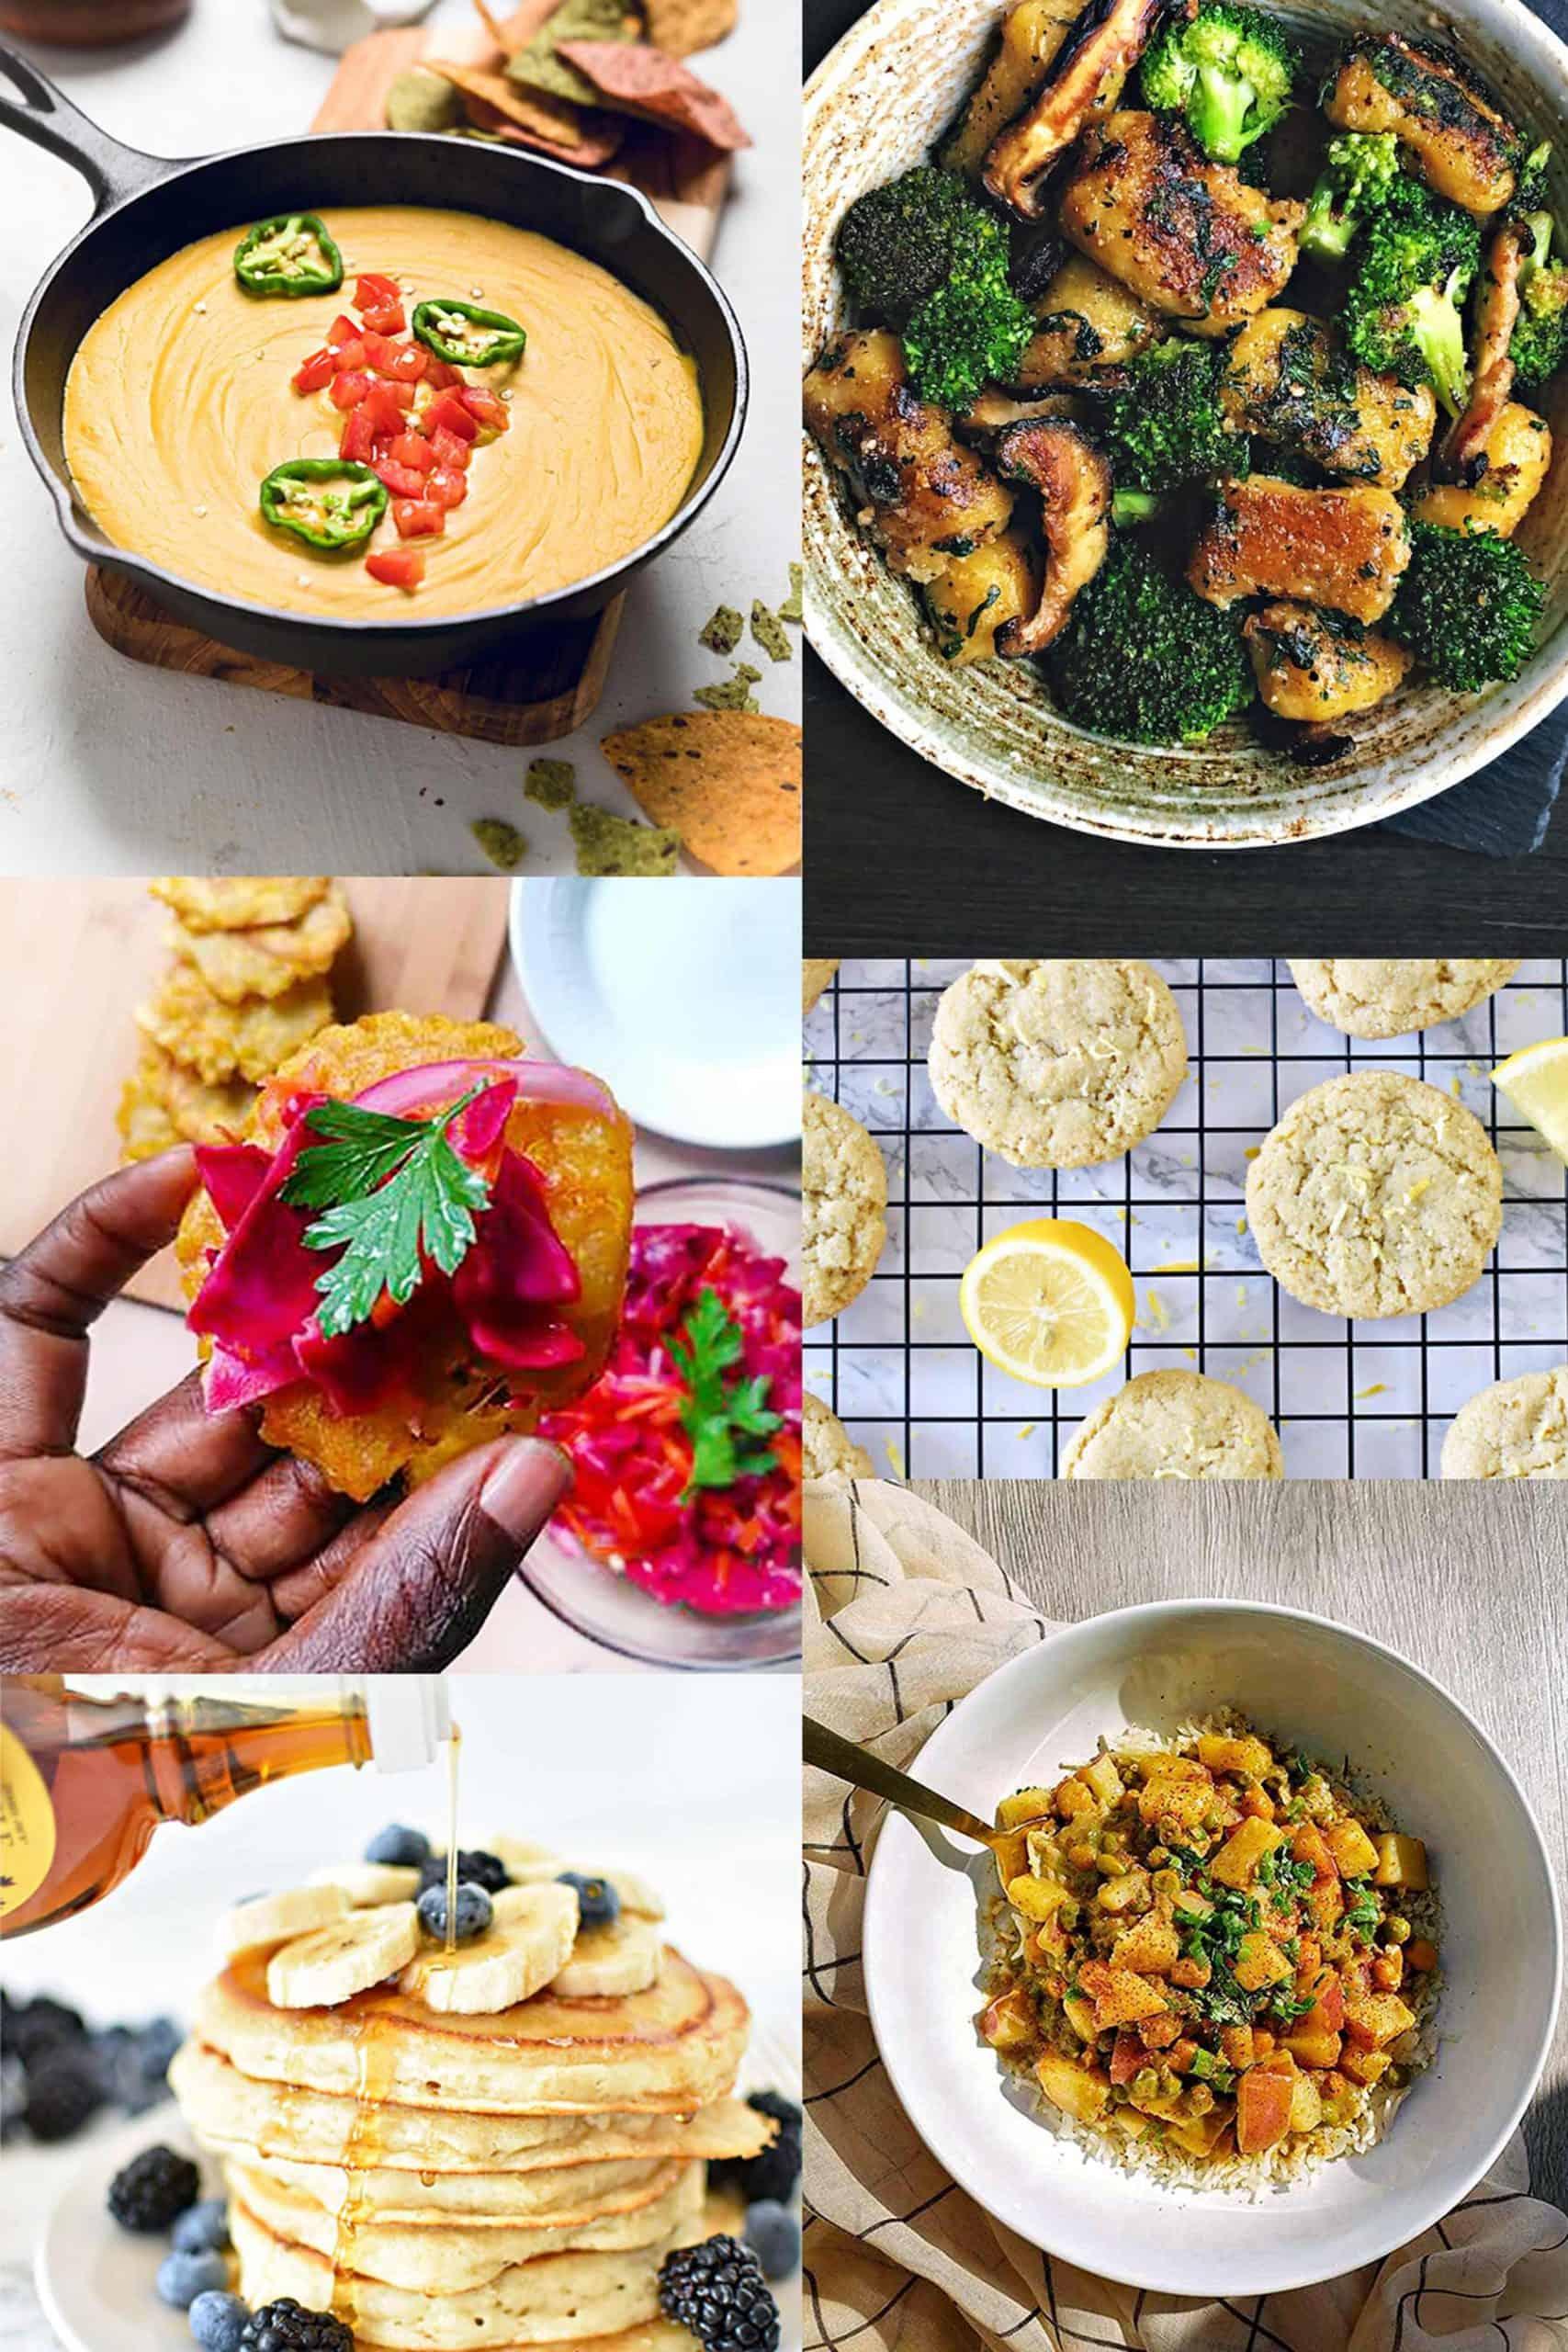 Image collage of Low-Effort Vegan Recipes from Black creators